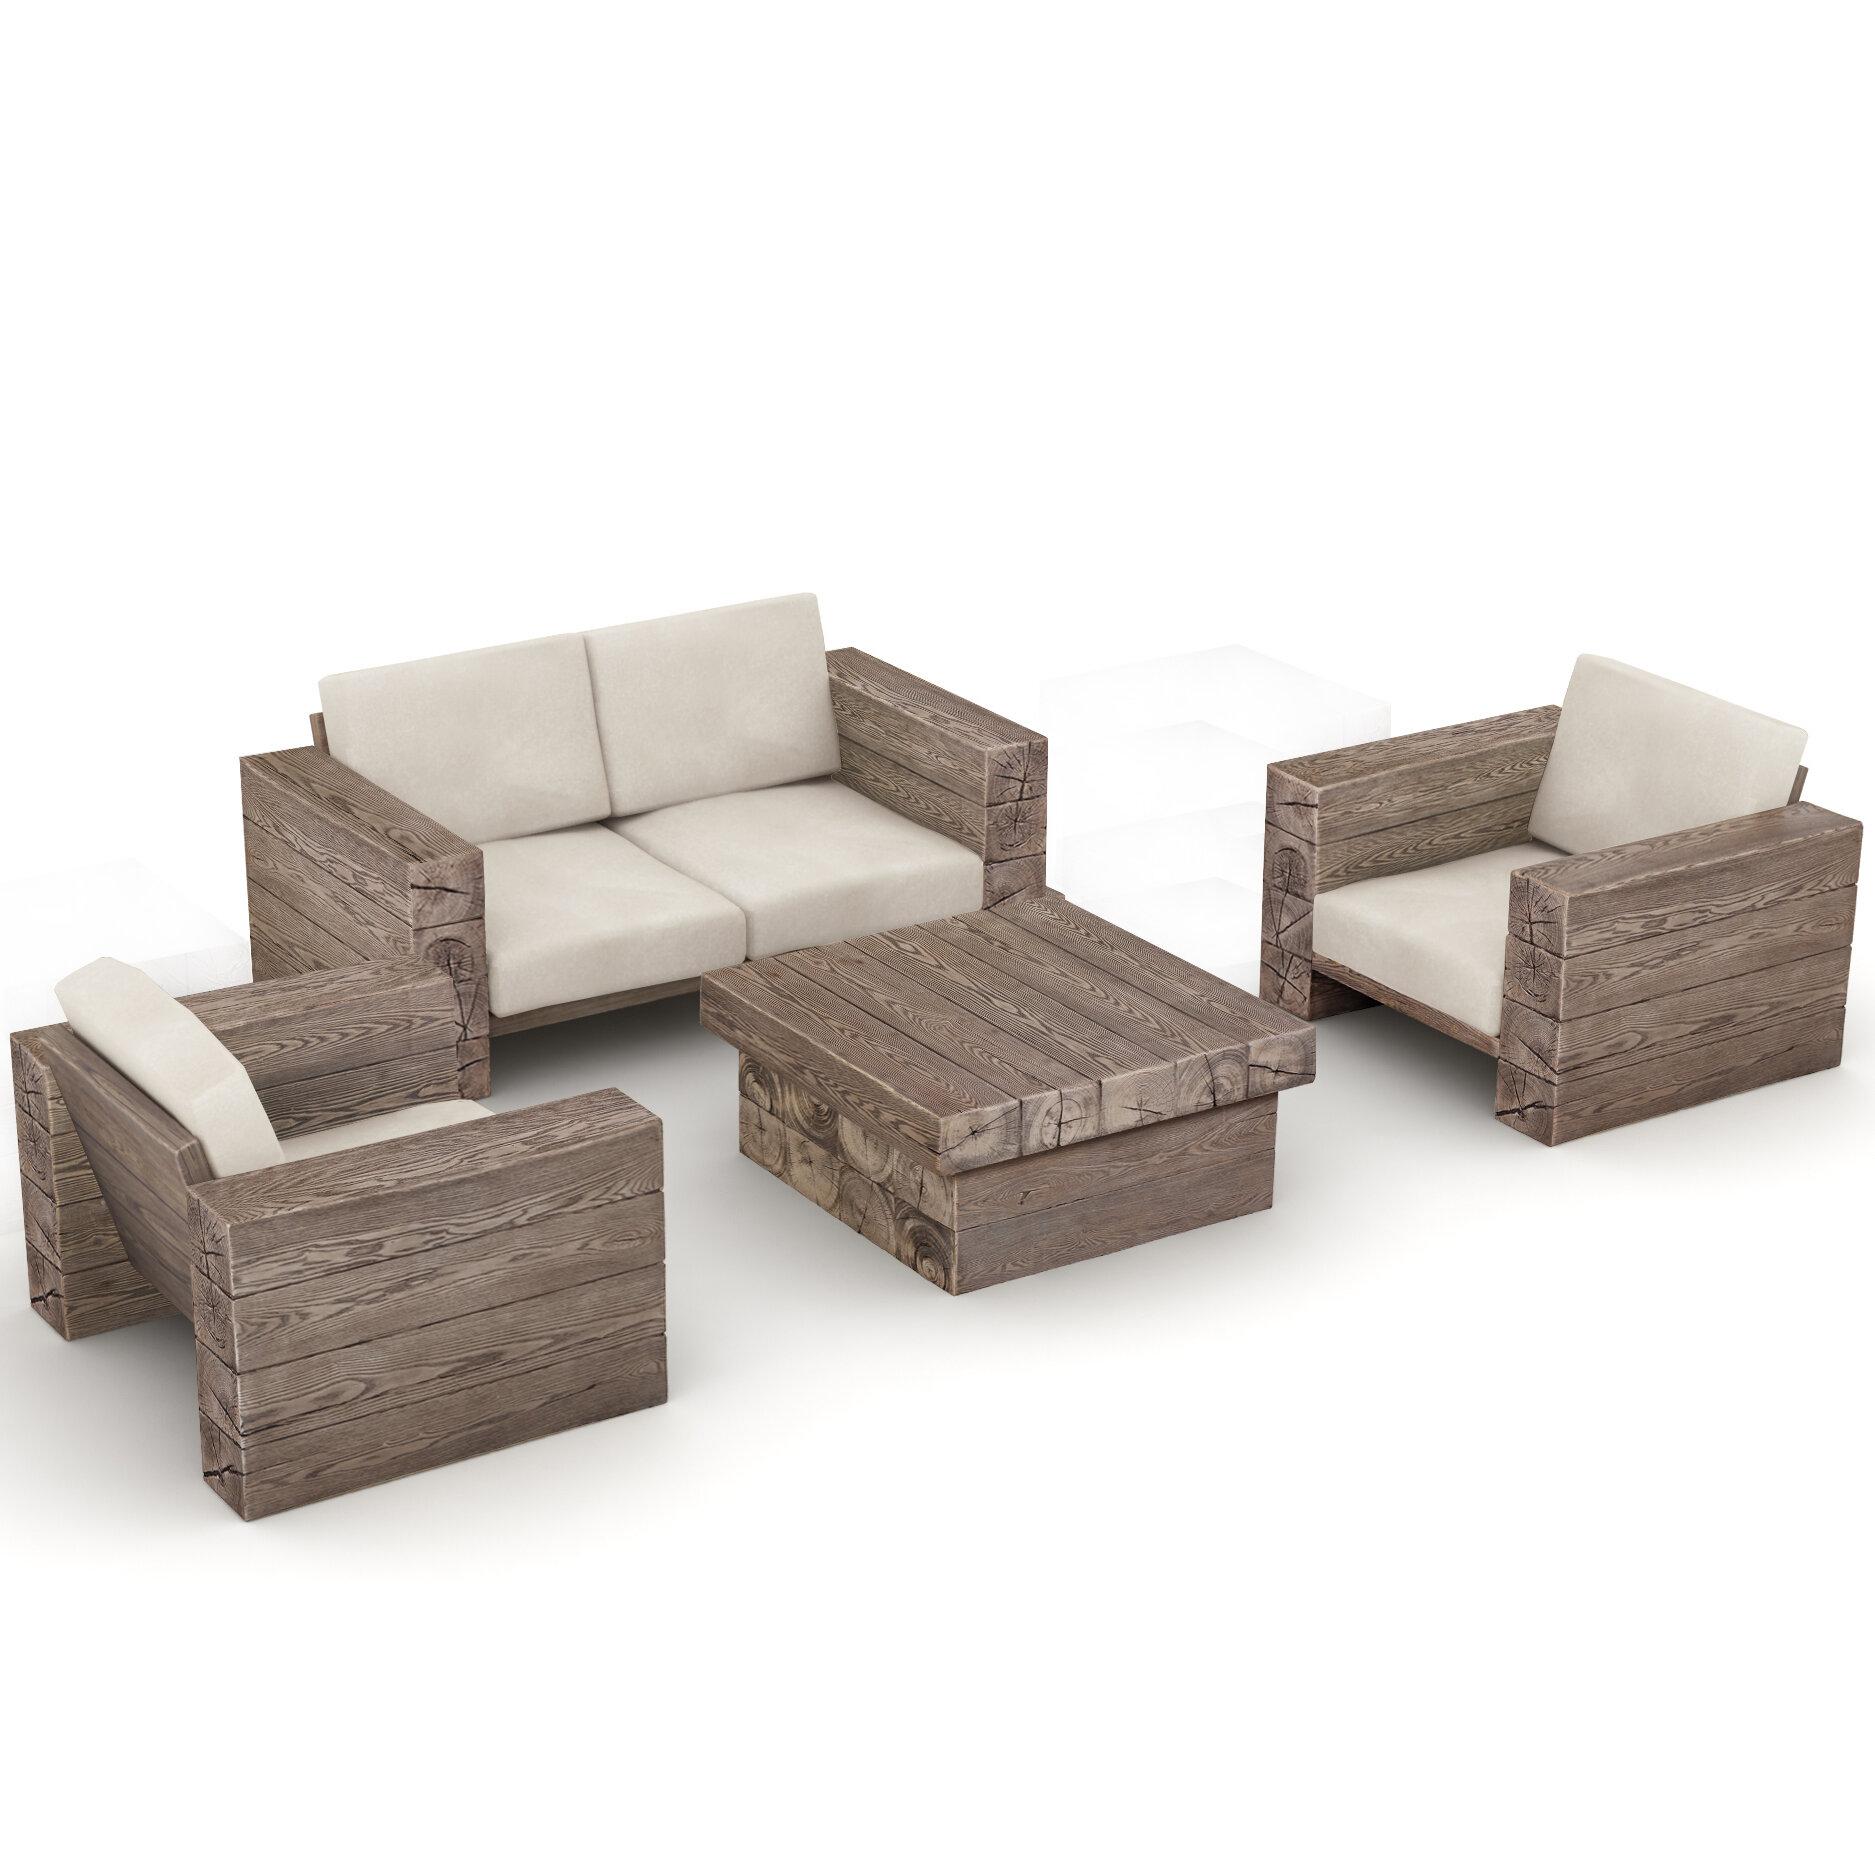 Incredible Corum 4 Seater Sofa Set Download Free Architecture Designs Xaembritishbridgeorg